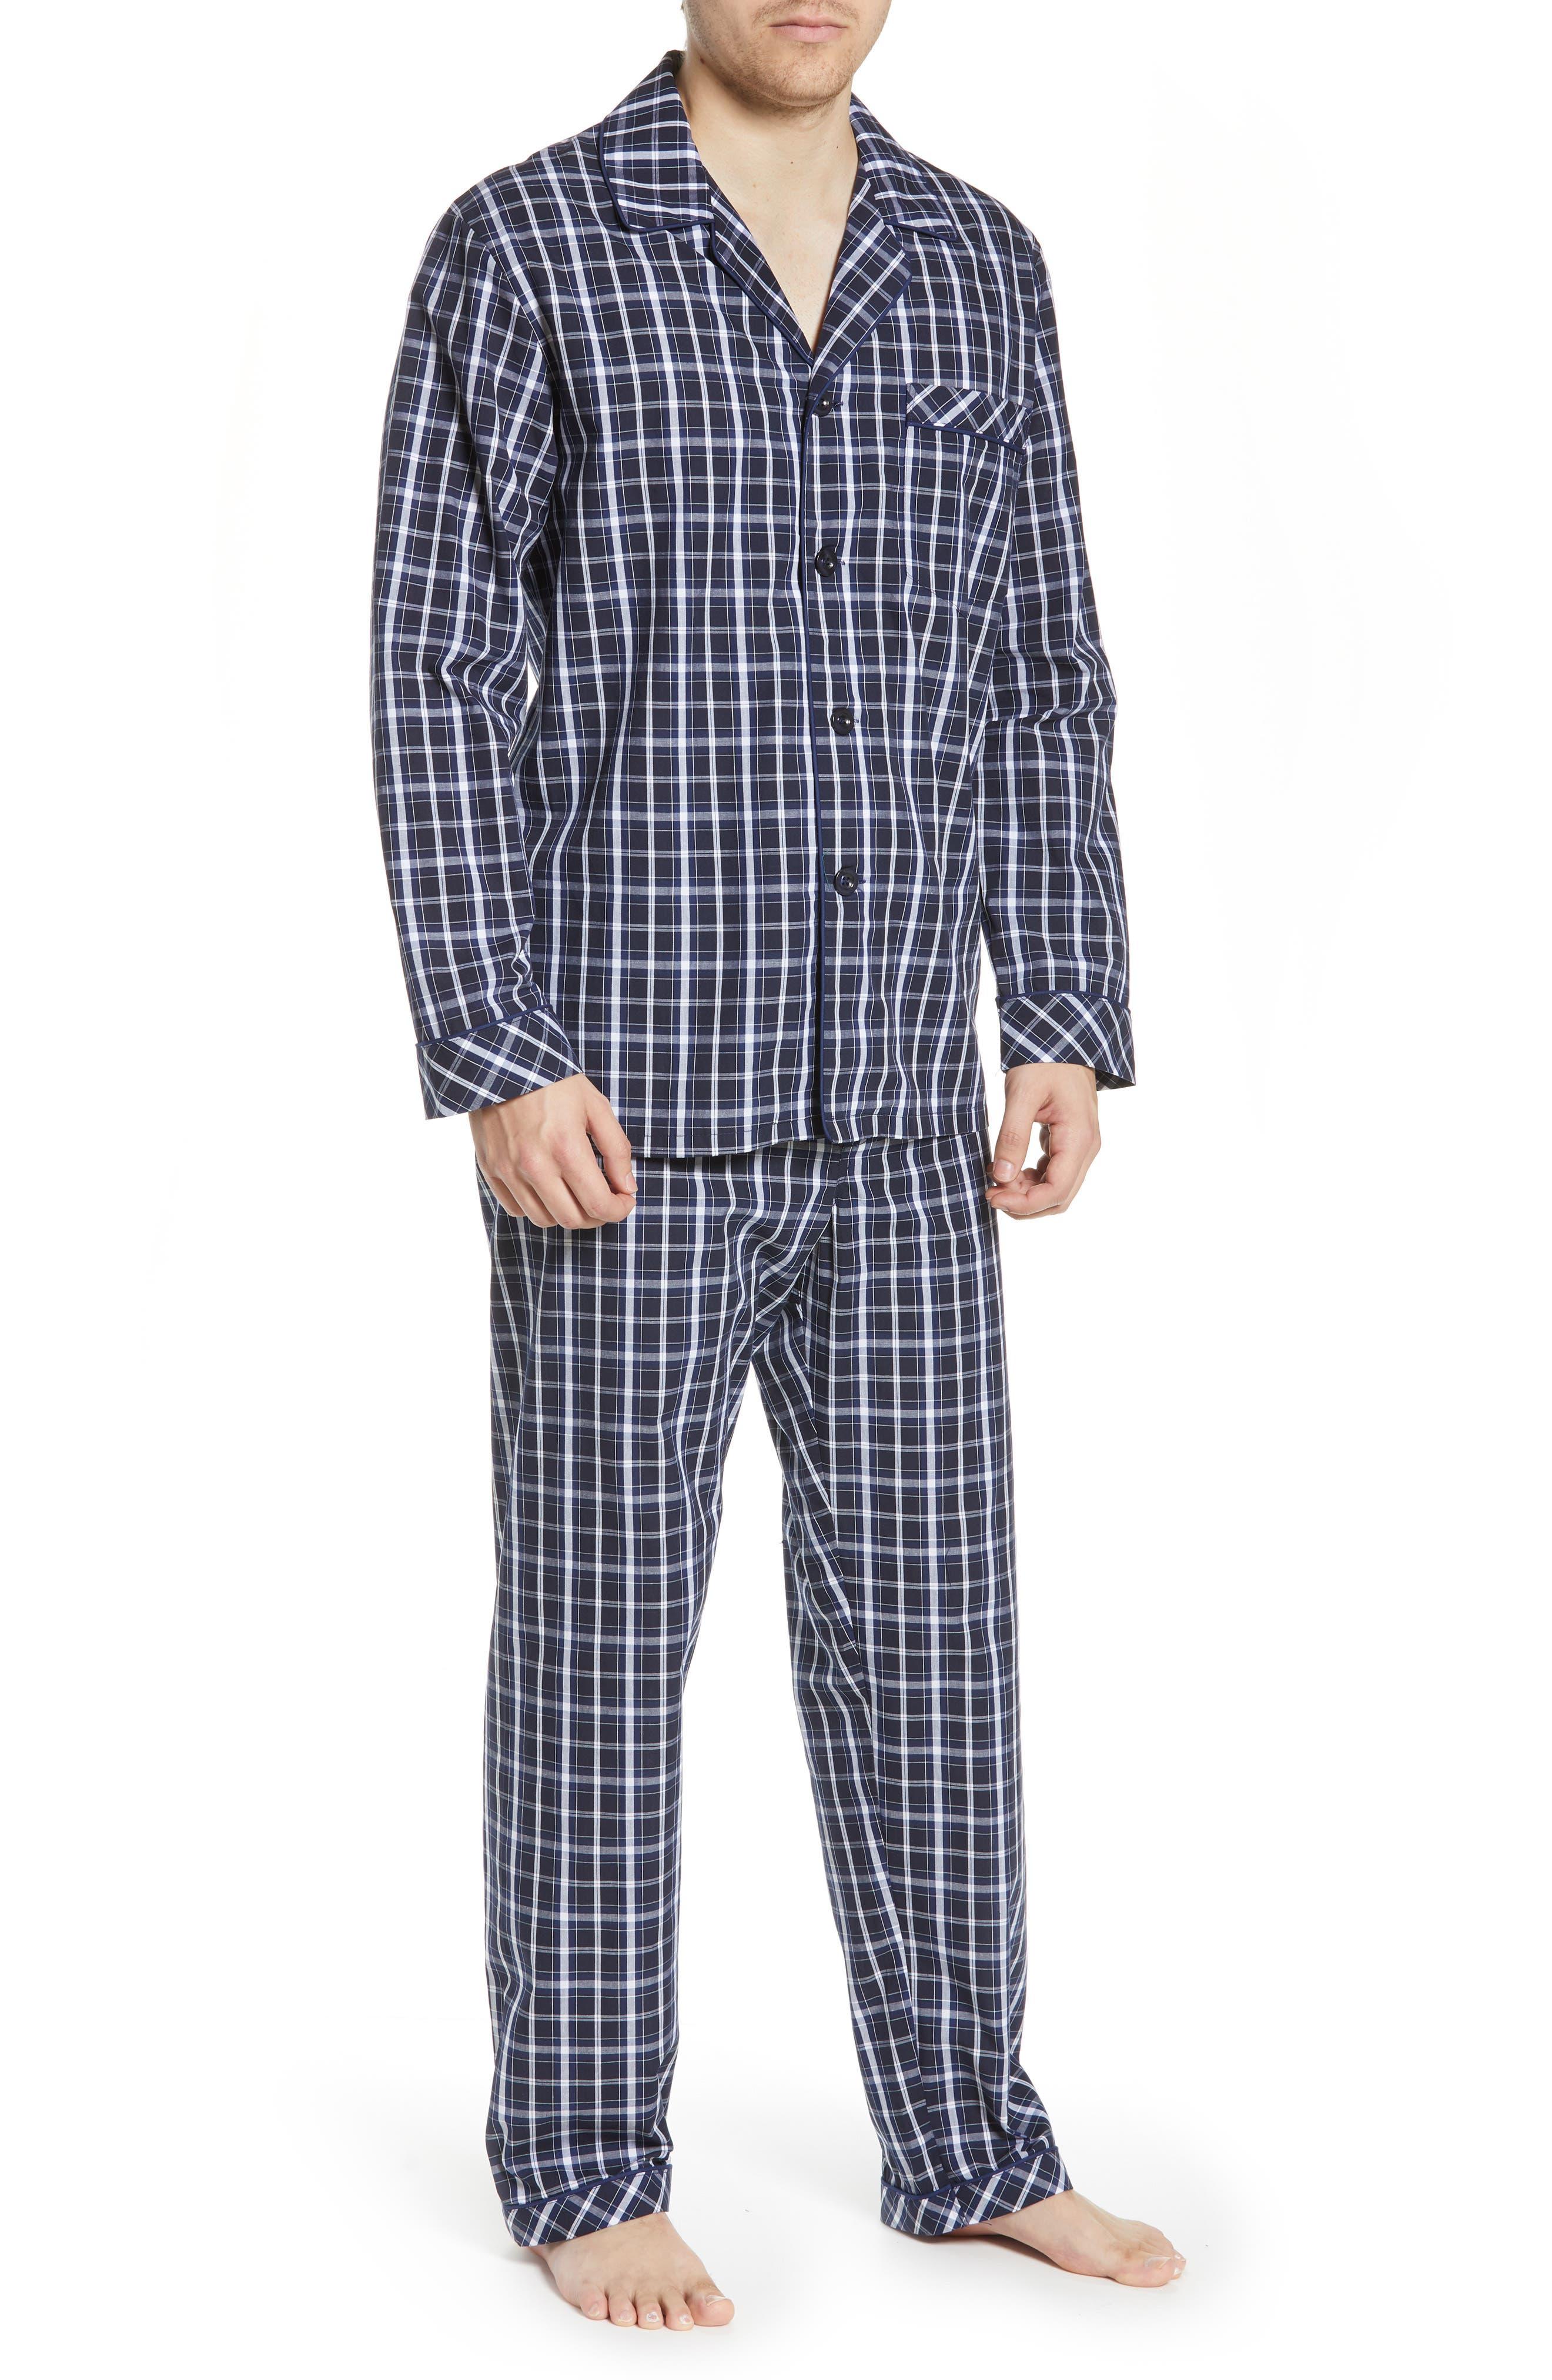 MAJESTIC INTERNATIONAL, Marcus Cotton Pajamas, Main thumbnail 1, color, 402